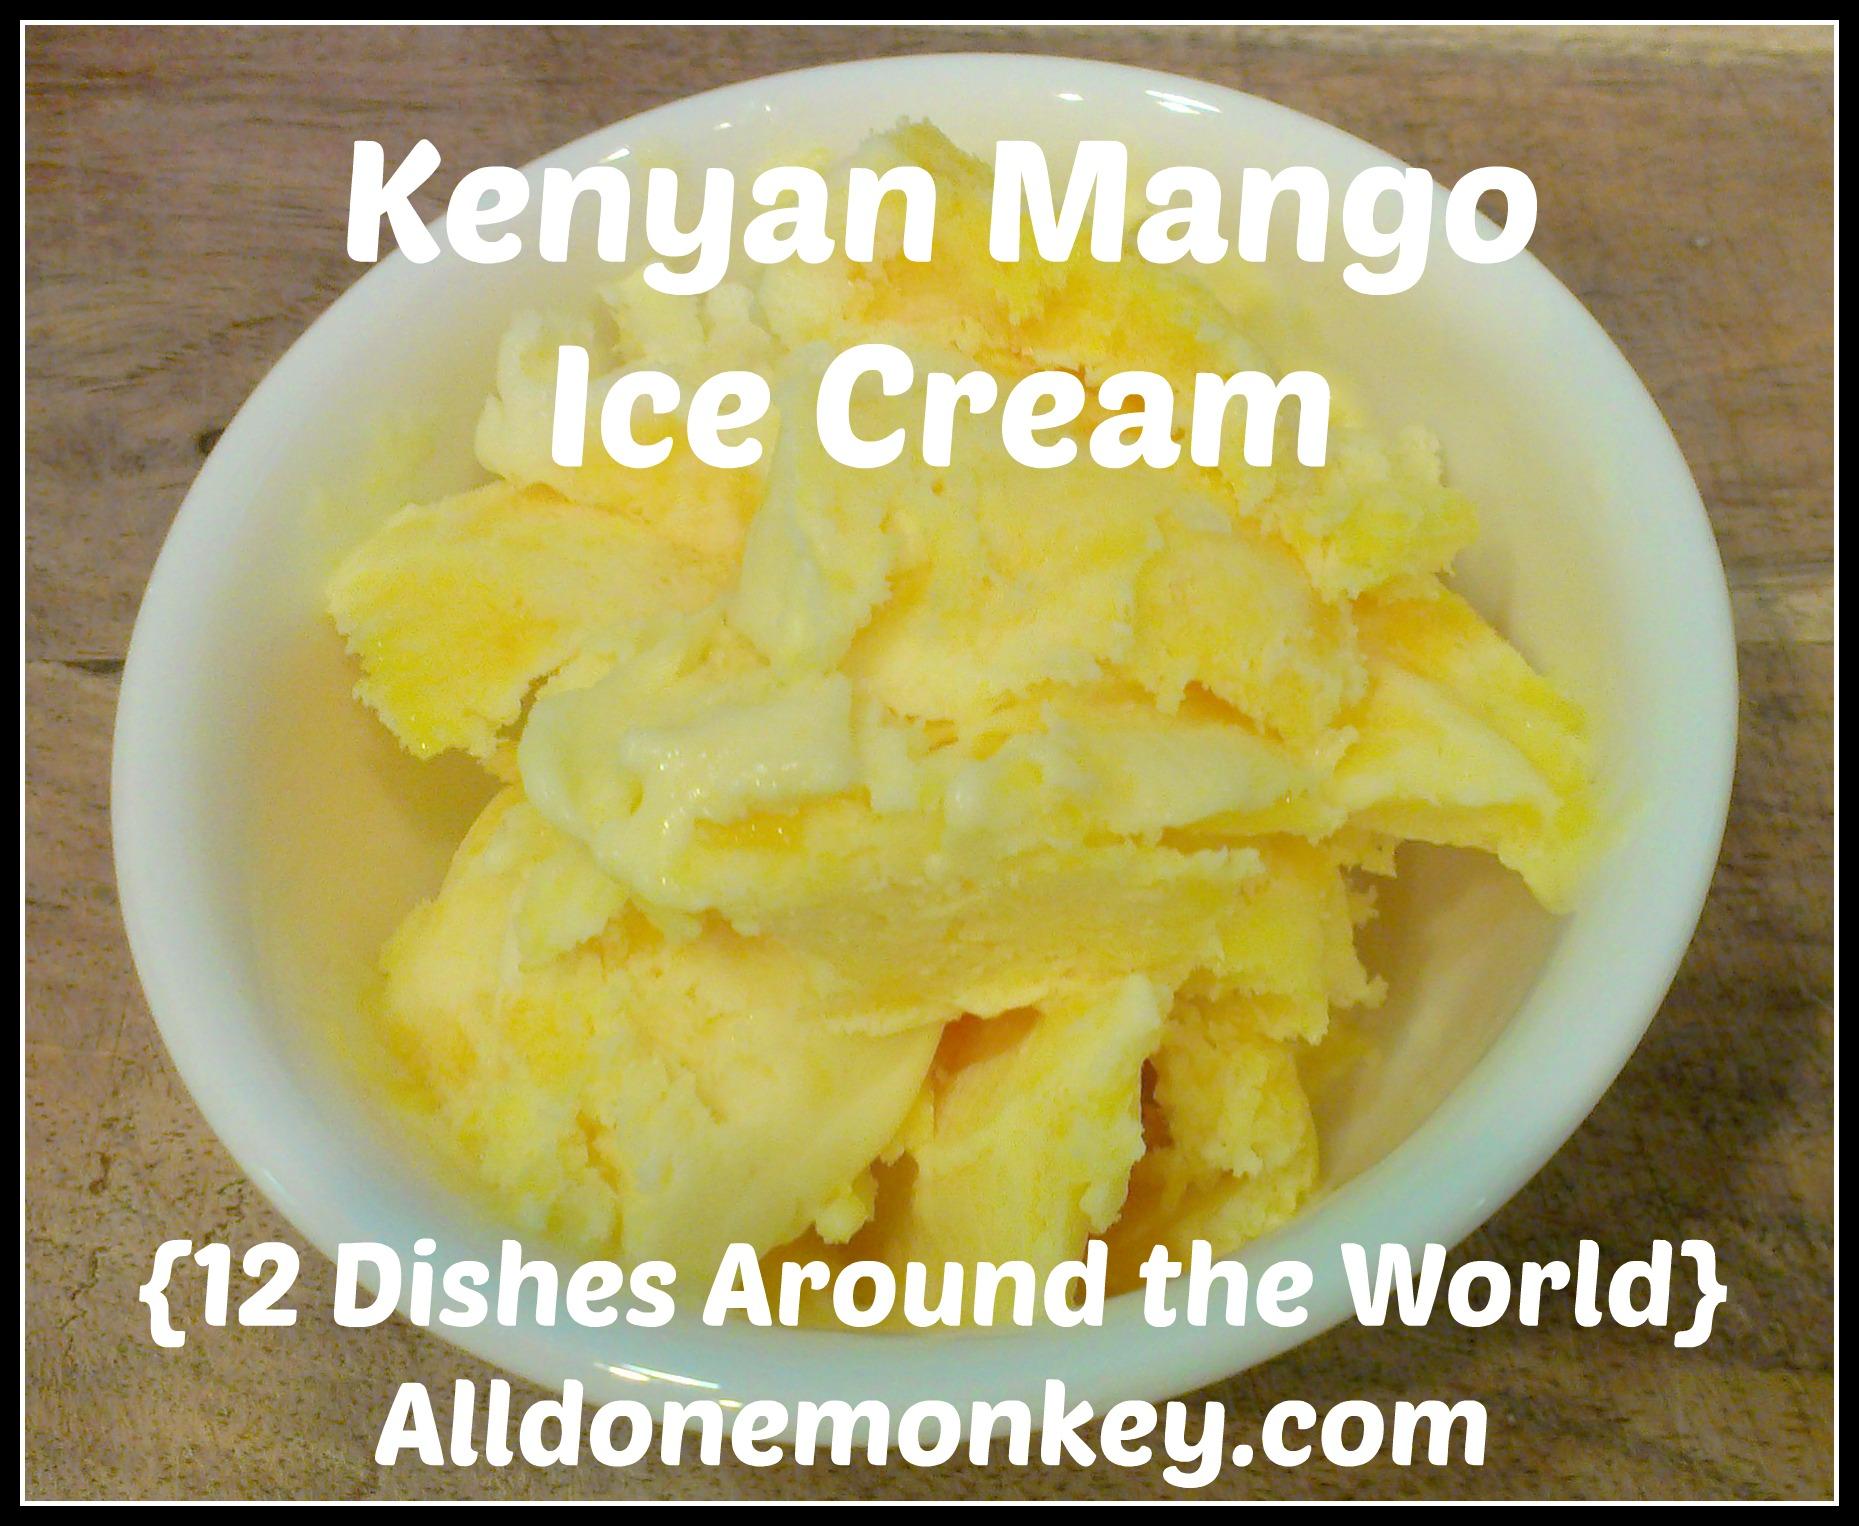 Kenyan mango ice cream around the world in 12 dishes all done kenyan mango ice cream around the world in 12 dishes alldonemonkey forumfinder Image collections